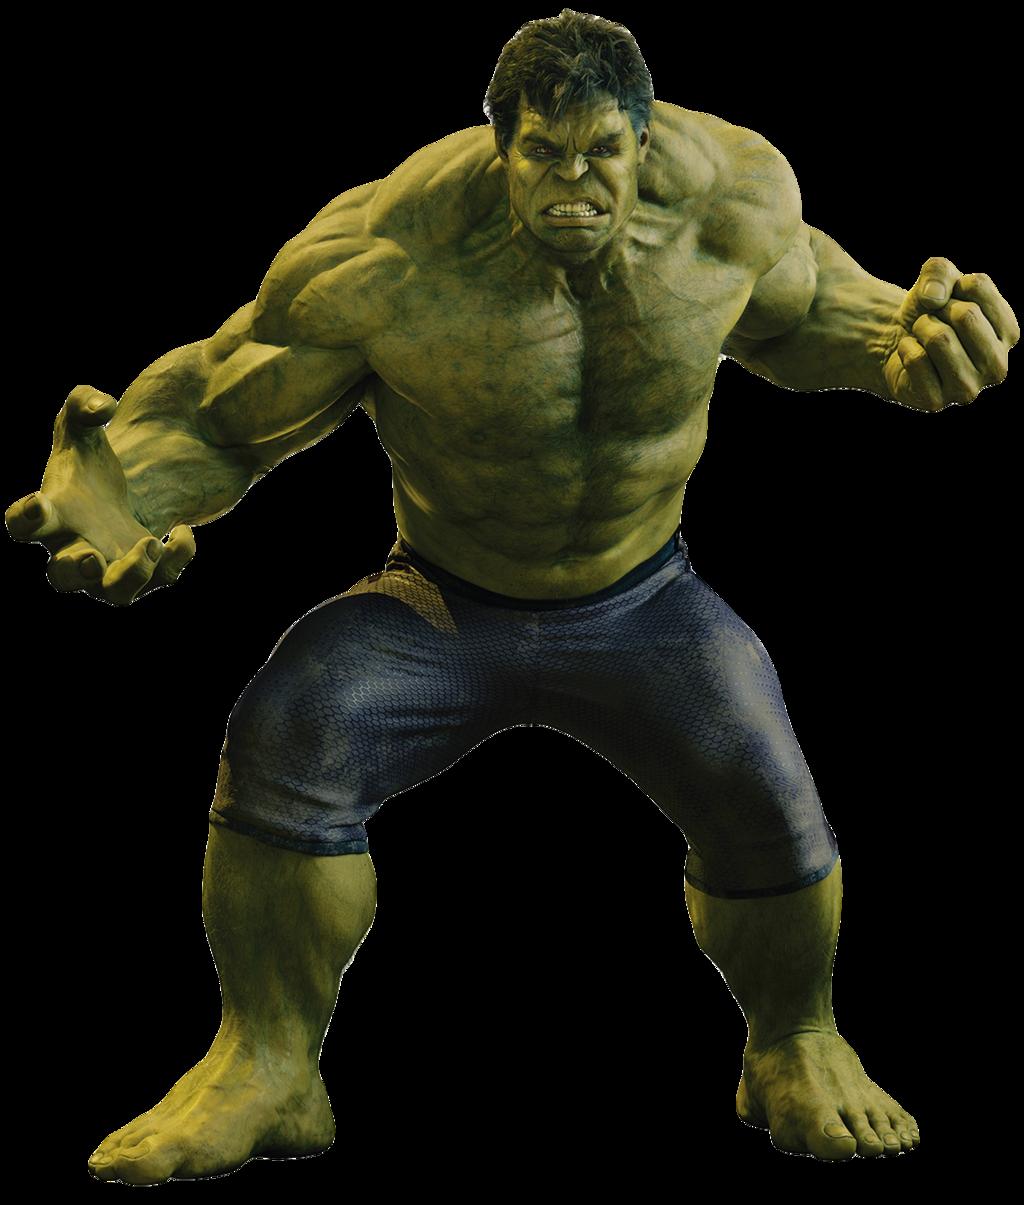 Hulk clipart transparent #4